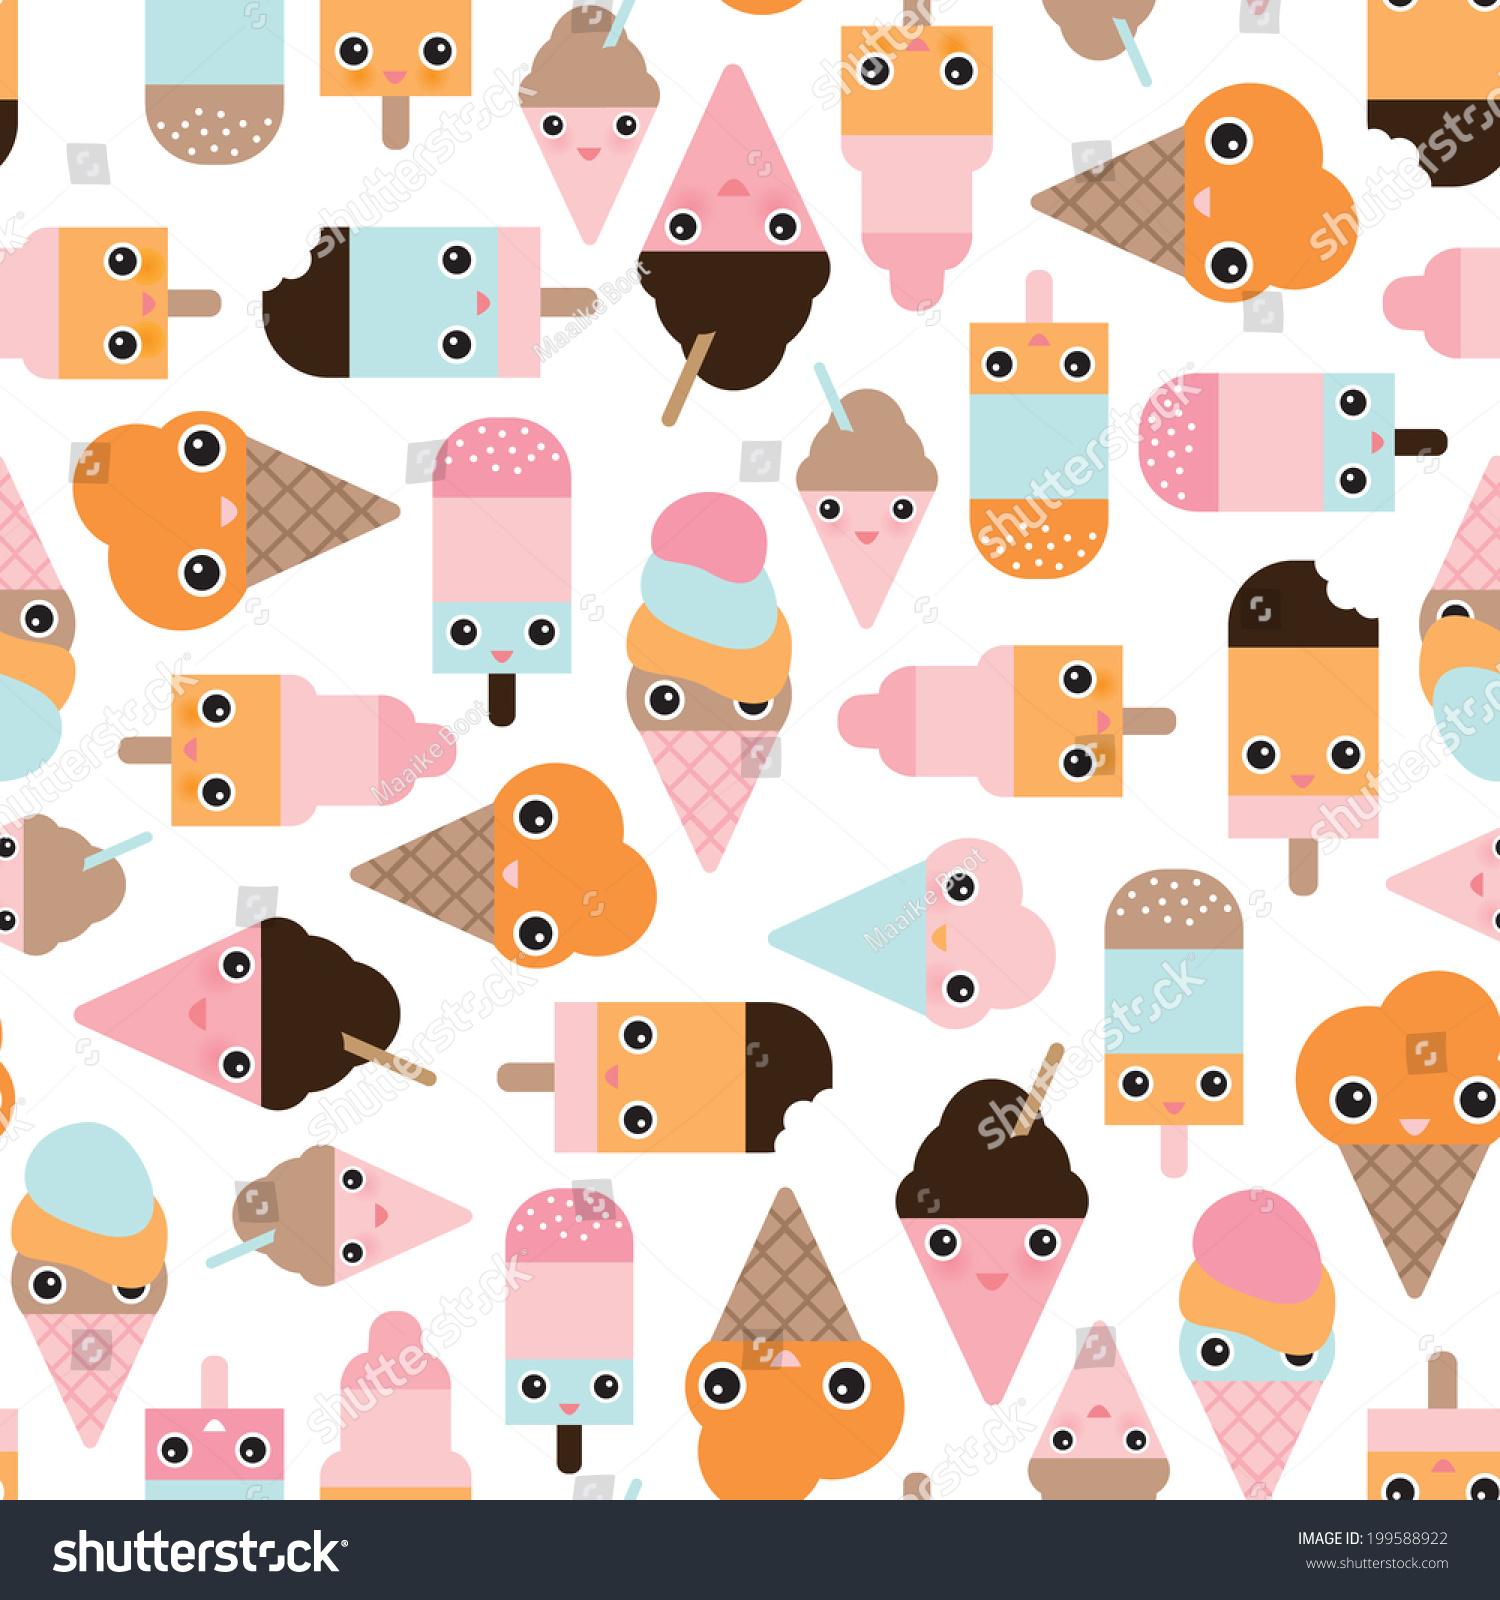 Cute Ice Cream Background: Seamless Summer Ice Cream Popsicle Cute Japanese Style